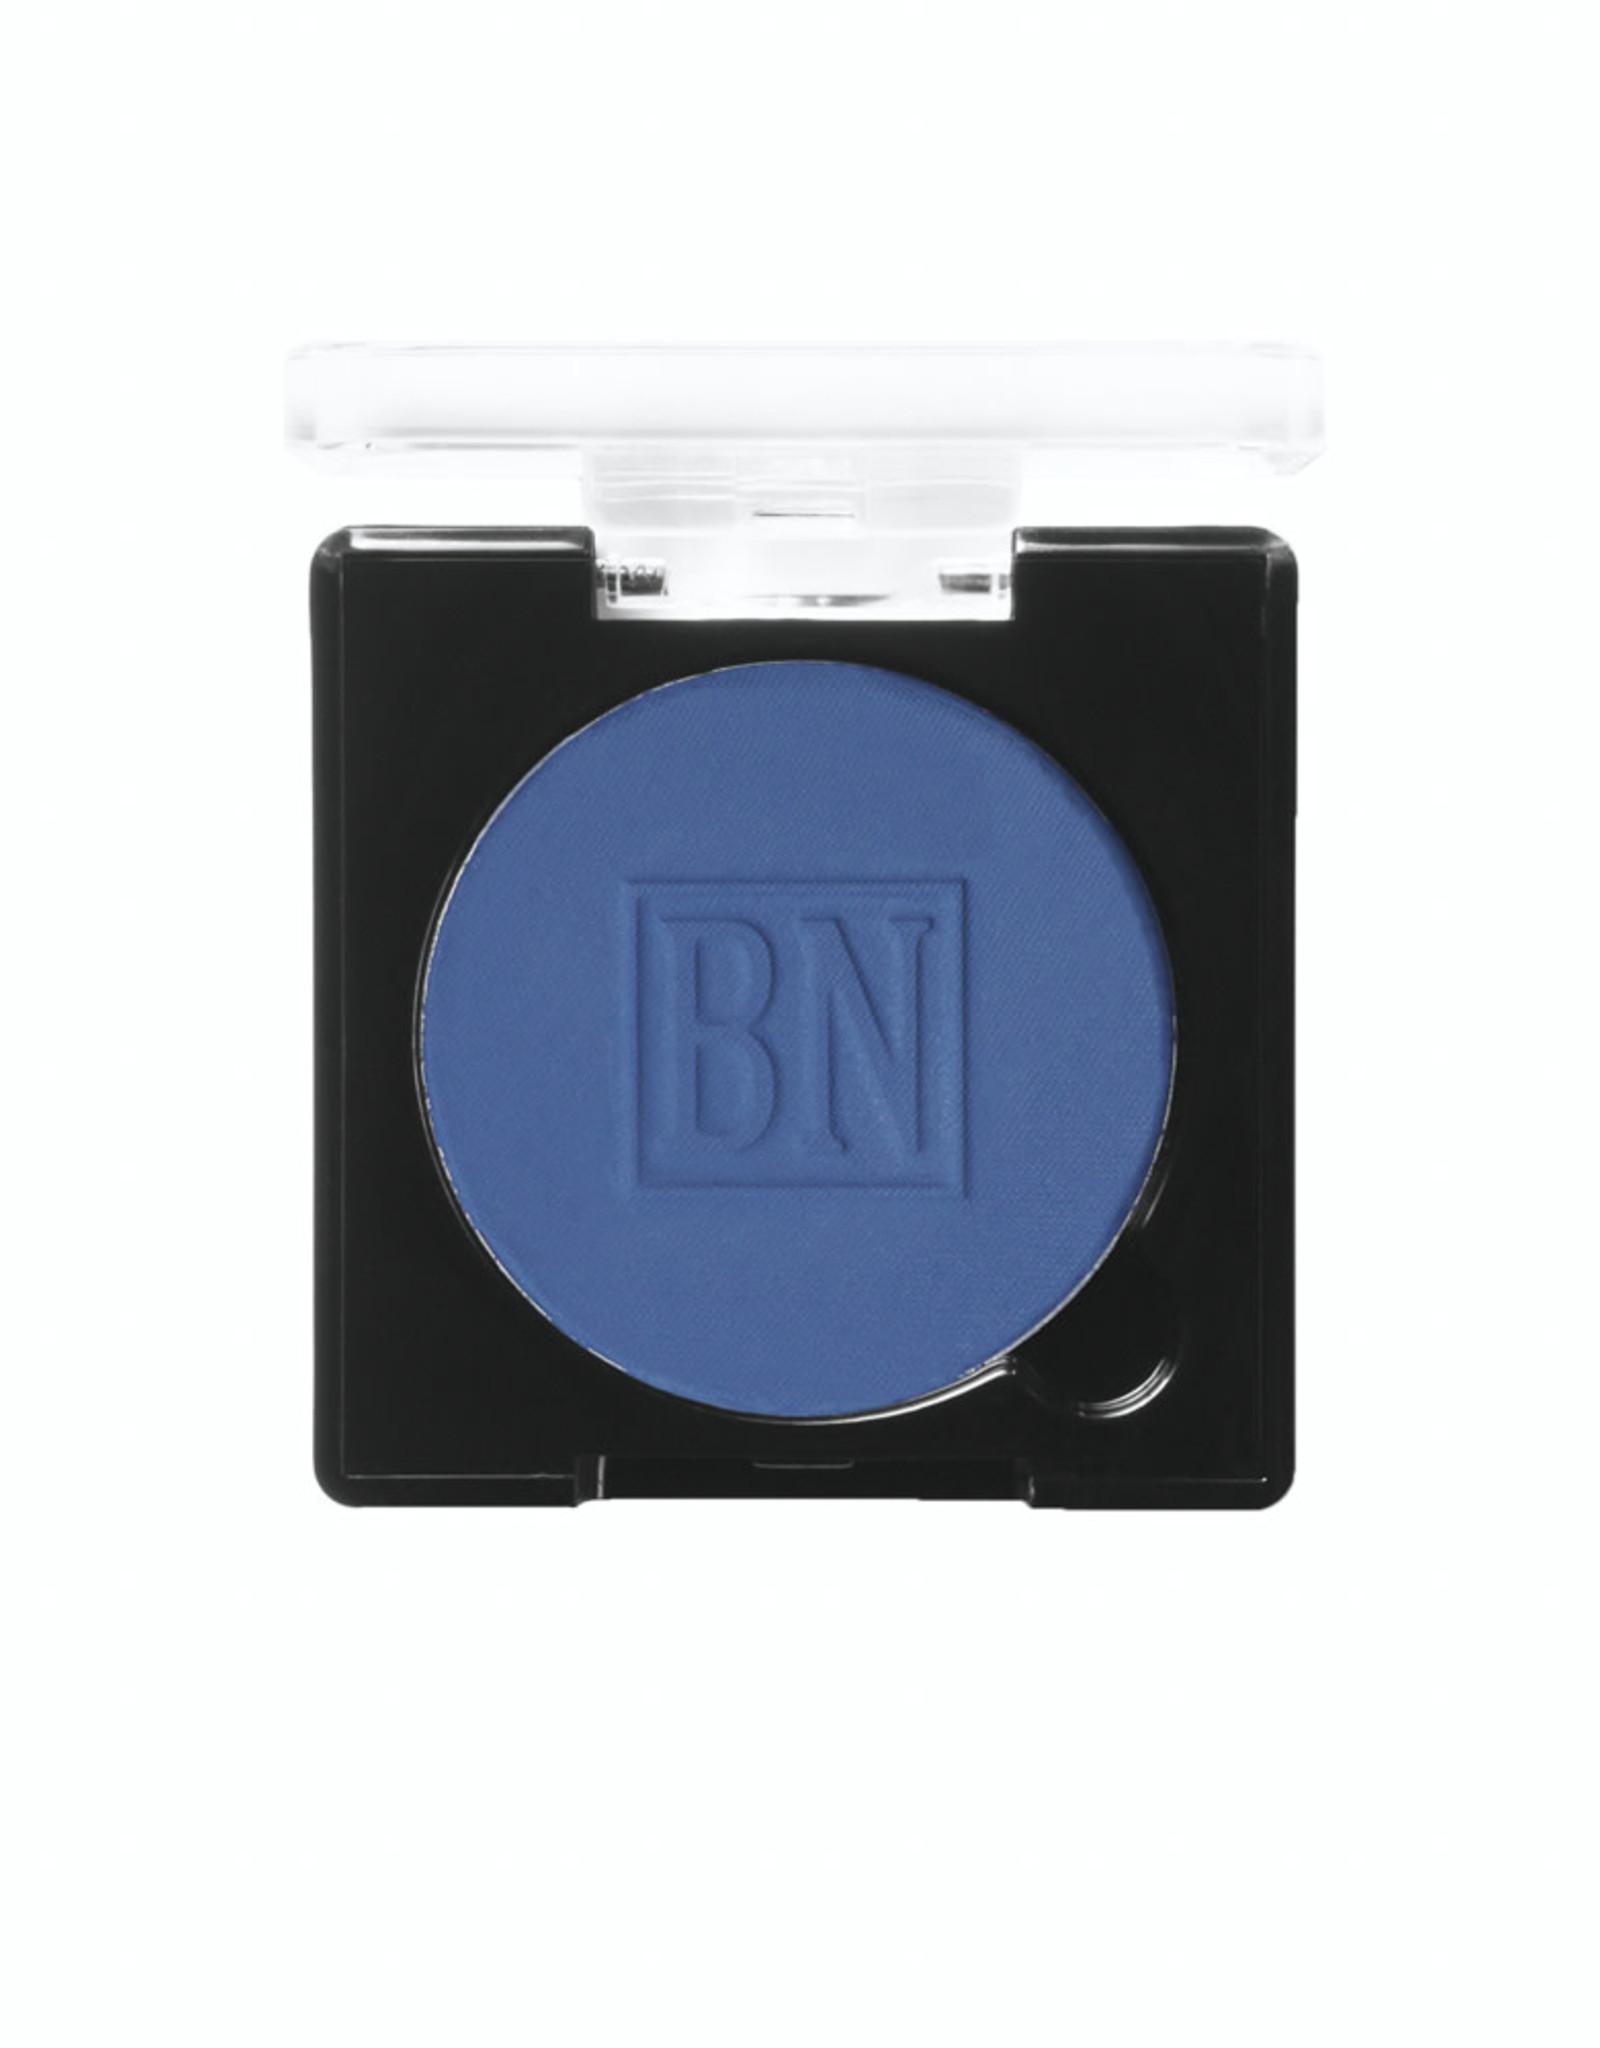 Ben Nye EYE SHADOW, NAVY BLUE,.12 OZ